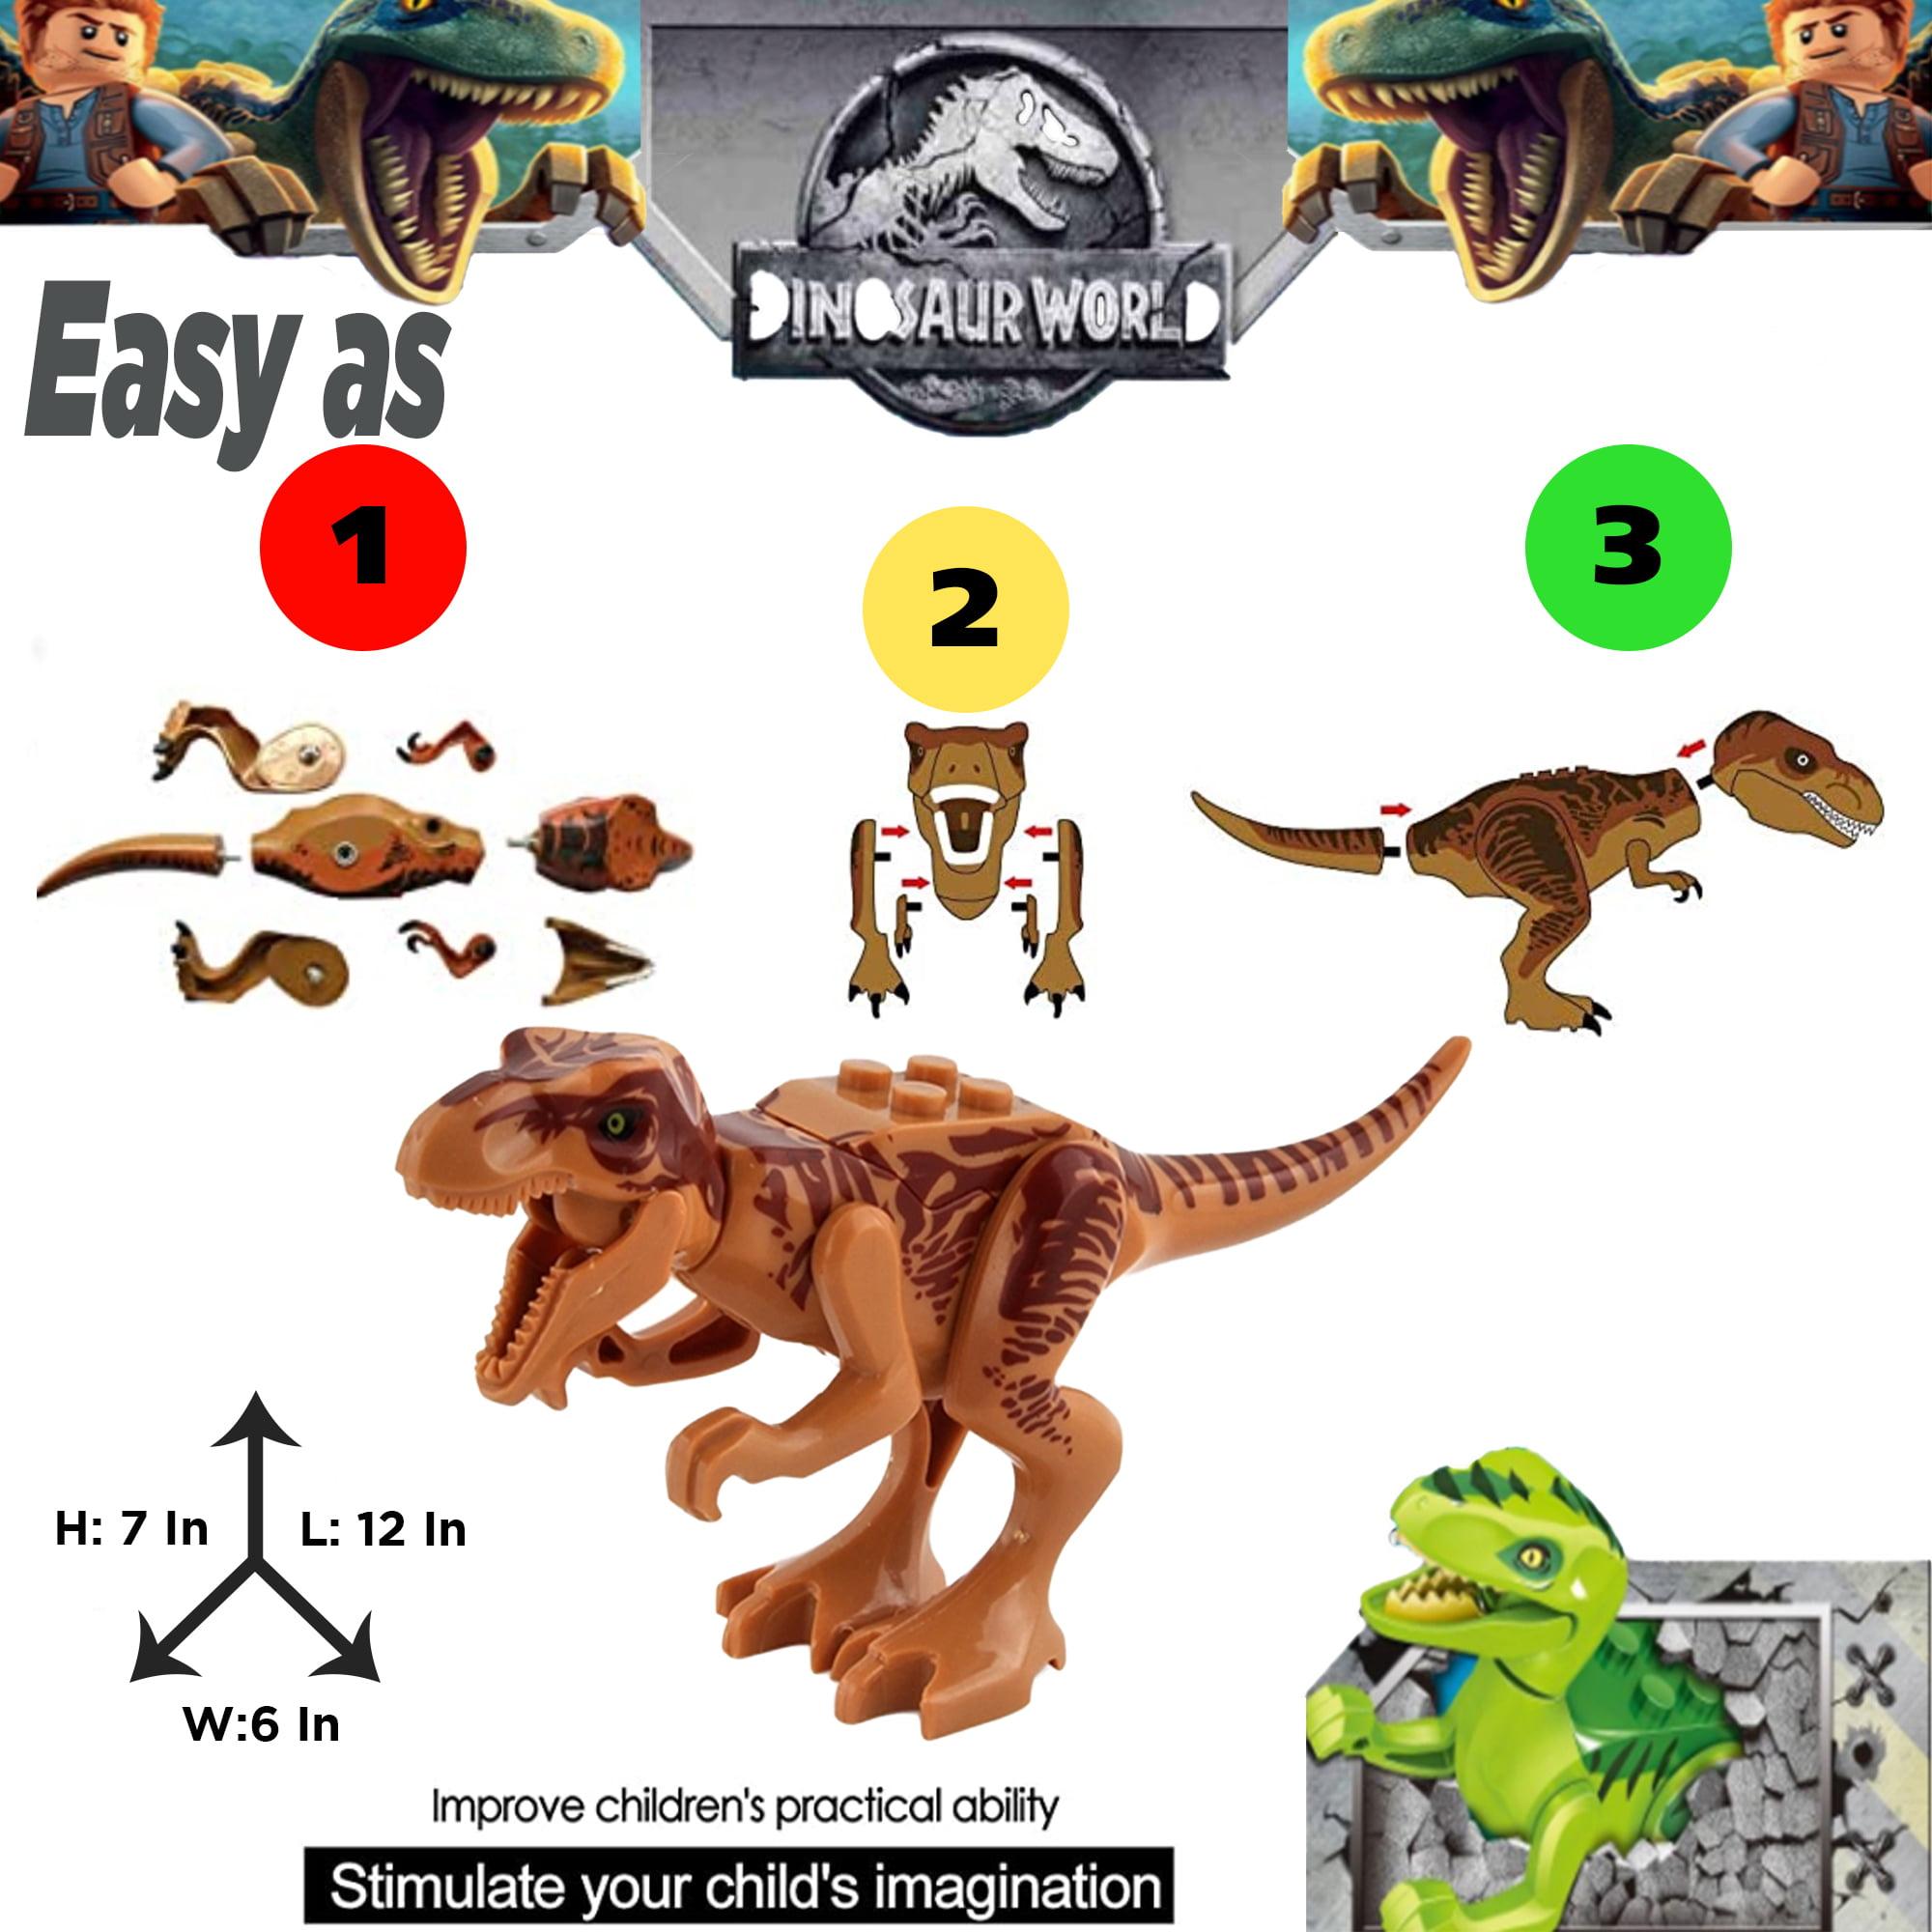 Triceratops Boys and Girls Creative Dinosaur Building Set Take Apart Dino Action Figures Kididdo Dinosaur Building Blocks 12 PCS T-Rex Velociraptor